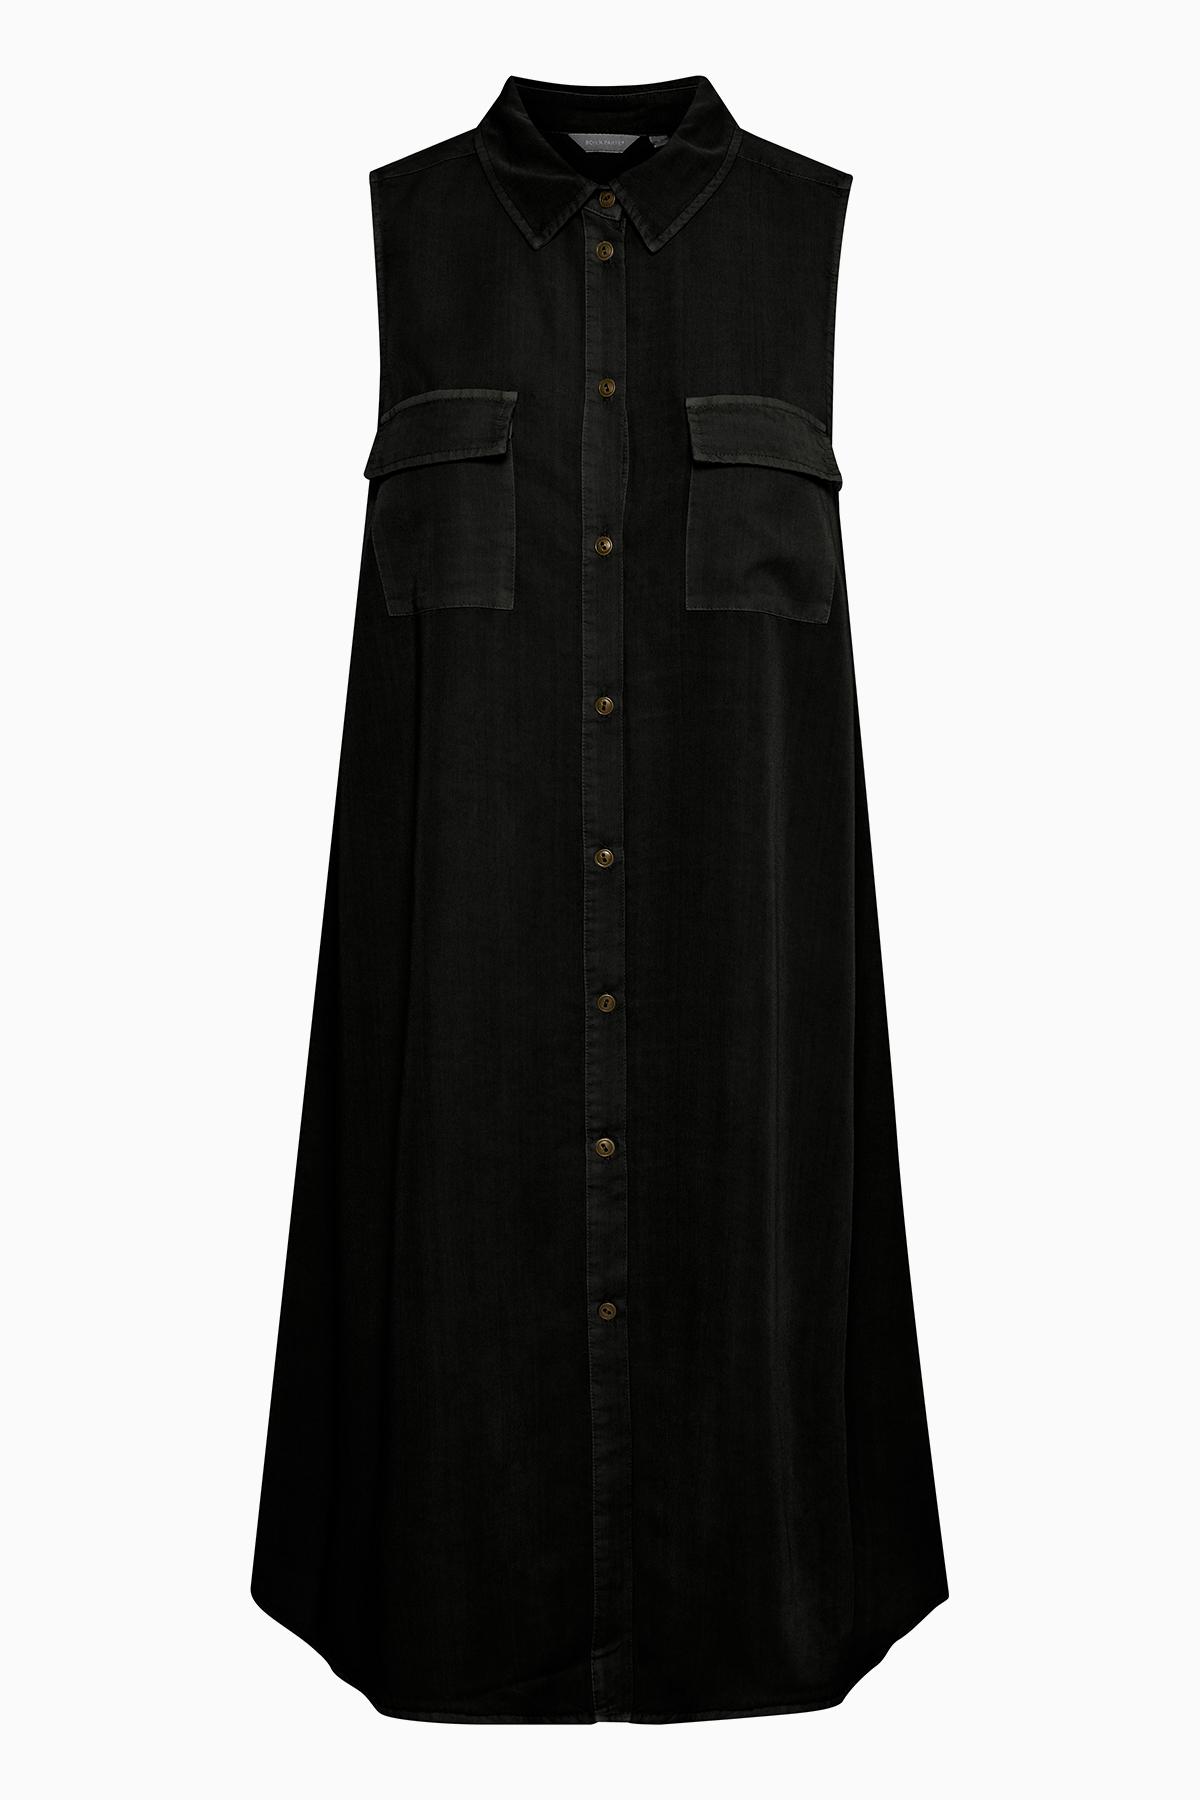 BonA Parte Dame Flot kjole - Sort